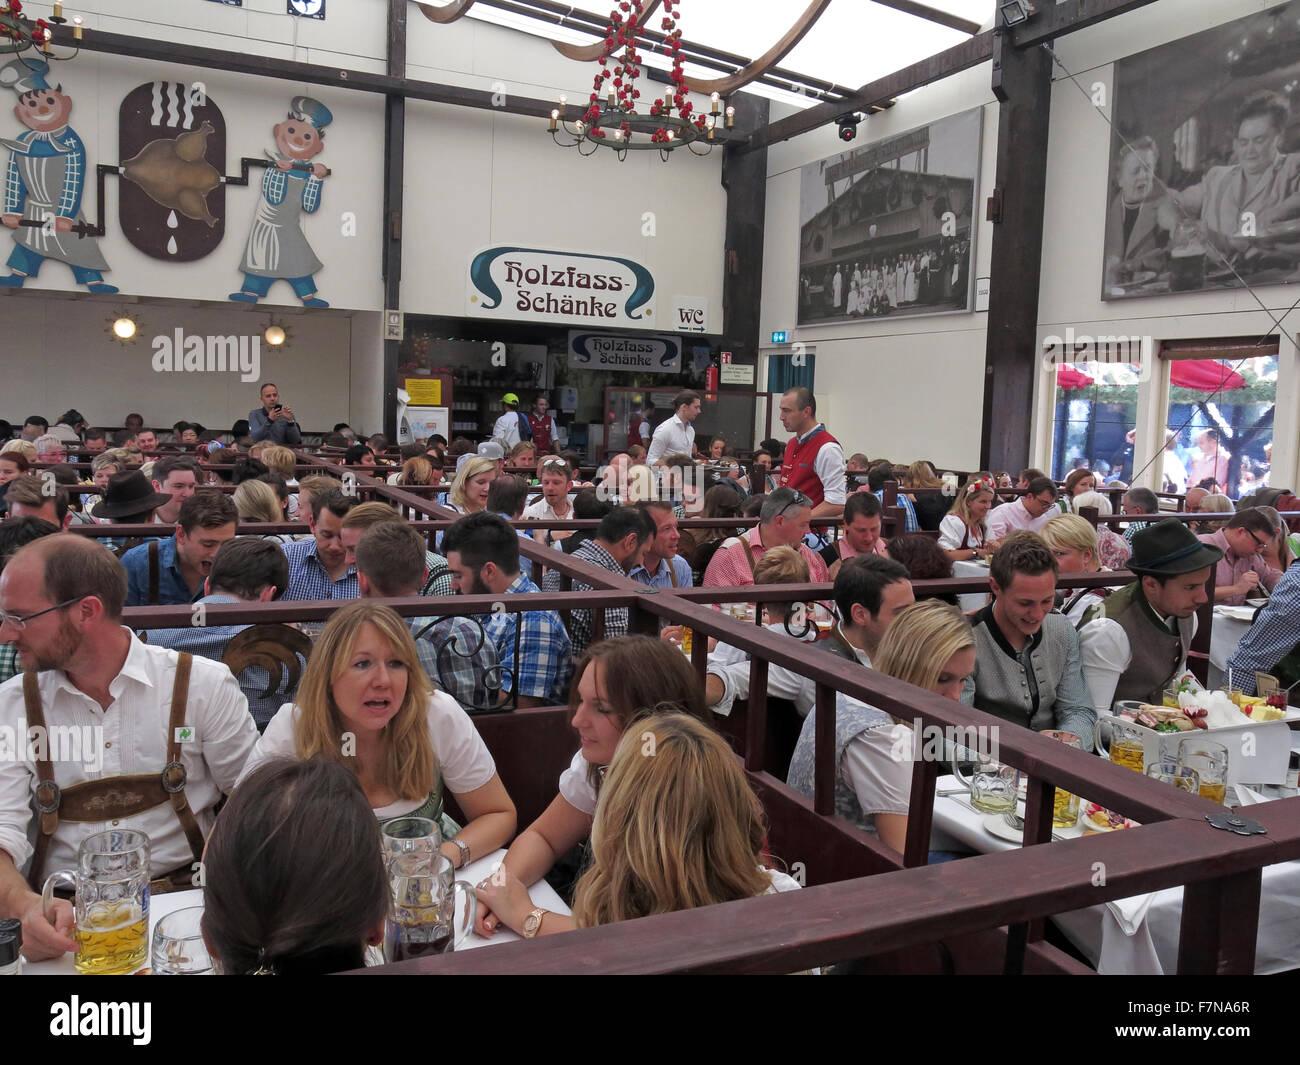 Diners,drinkers,tourists,tourist,indoor,indoors,people,eat,eating,Bavaria,Germany,Munchen,stein,steins,Beer,brew,brewery,ale,ammer,autumn,bavaria,beer,beer festival,beer garden,bier,blaukraut,bread,brezen,bright,building,buildings,buy images of,buy pictures of,center,volk,volks,GoTonySmith,ale,ammer,autumn,bavaria,beer,beer festival,beer garden,bier,blaukraut,bread,brezen,bright,building,buildings,buy images of,buy pictures of,center,centre,chicken,dirndl,dumplings,enjoyment,event,fairgrounds,festival,field,fun,funfair,garden,garten,germany,gotonysmith,happy,in,kndel,ksesptzle,lederhosen,meadow,munchen,munich,munich octoberfest,munich oktoberfest,october,octoberfest,oktoberfest,oktoberfest beer,pancake,pork,potato,pretzels,reiberdatschi,roast,rotkohl,sauerkraut,scenes,sennerhut,sunny,table,tables,tent,therese,theresienwiese,ticket,tickets,tourism,tourist,tourists,tradition,traditional,travelling,tree,trees,unity day,volksfest,wiesn,Buy Pictures of,Buy Images Of